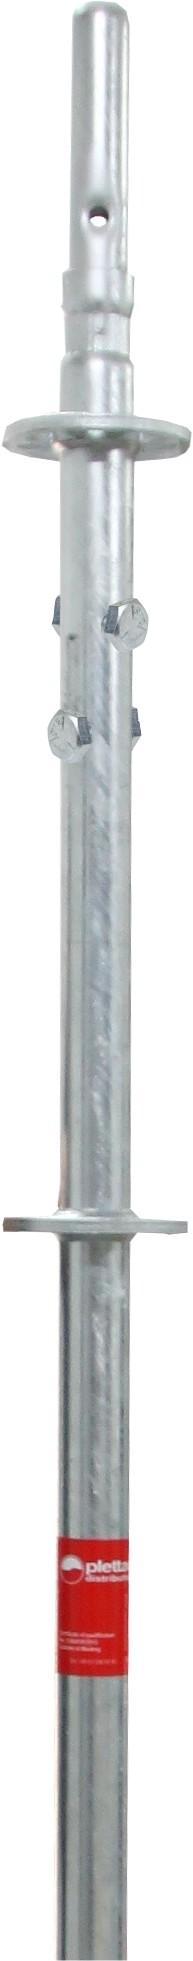 plettac distribution - Vertikale Tragelemente